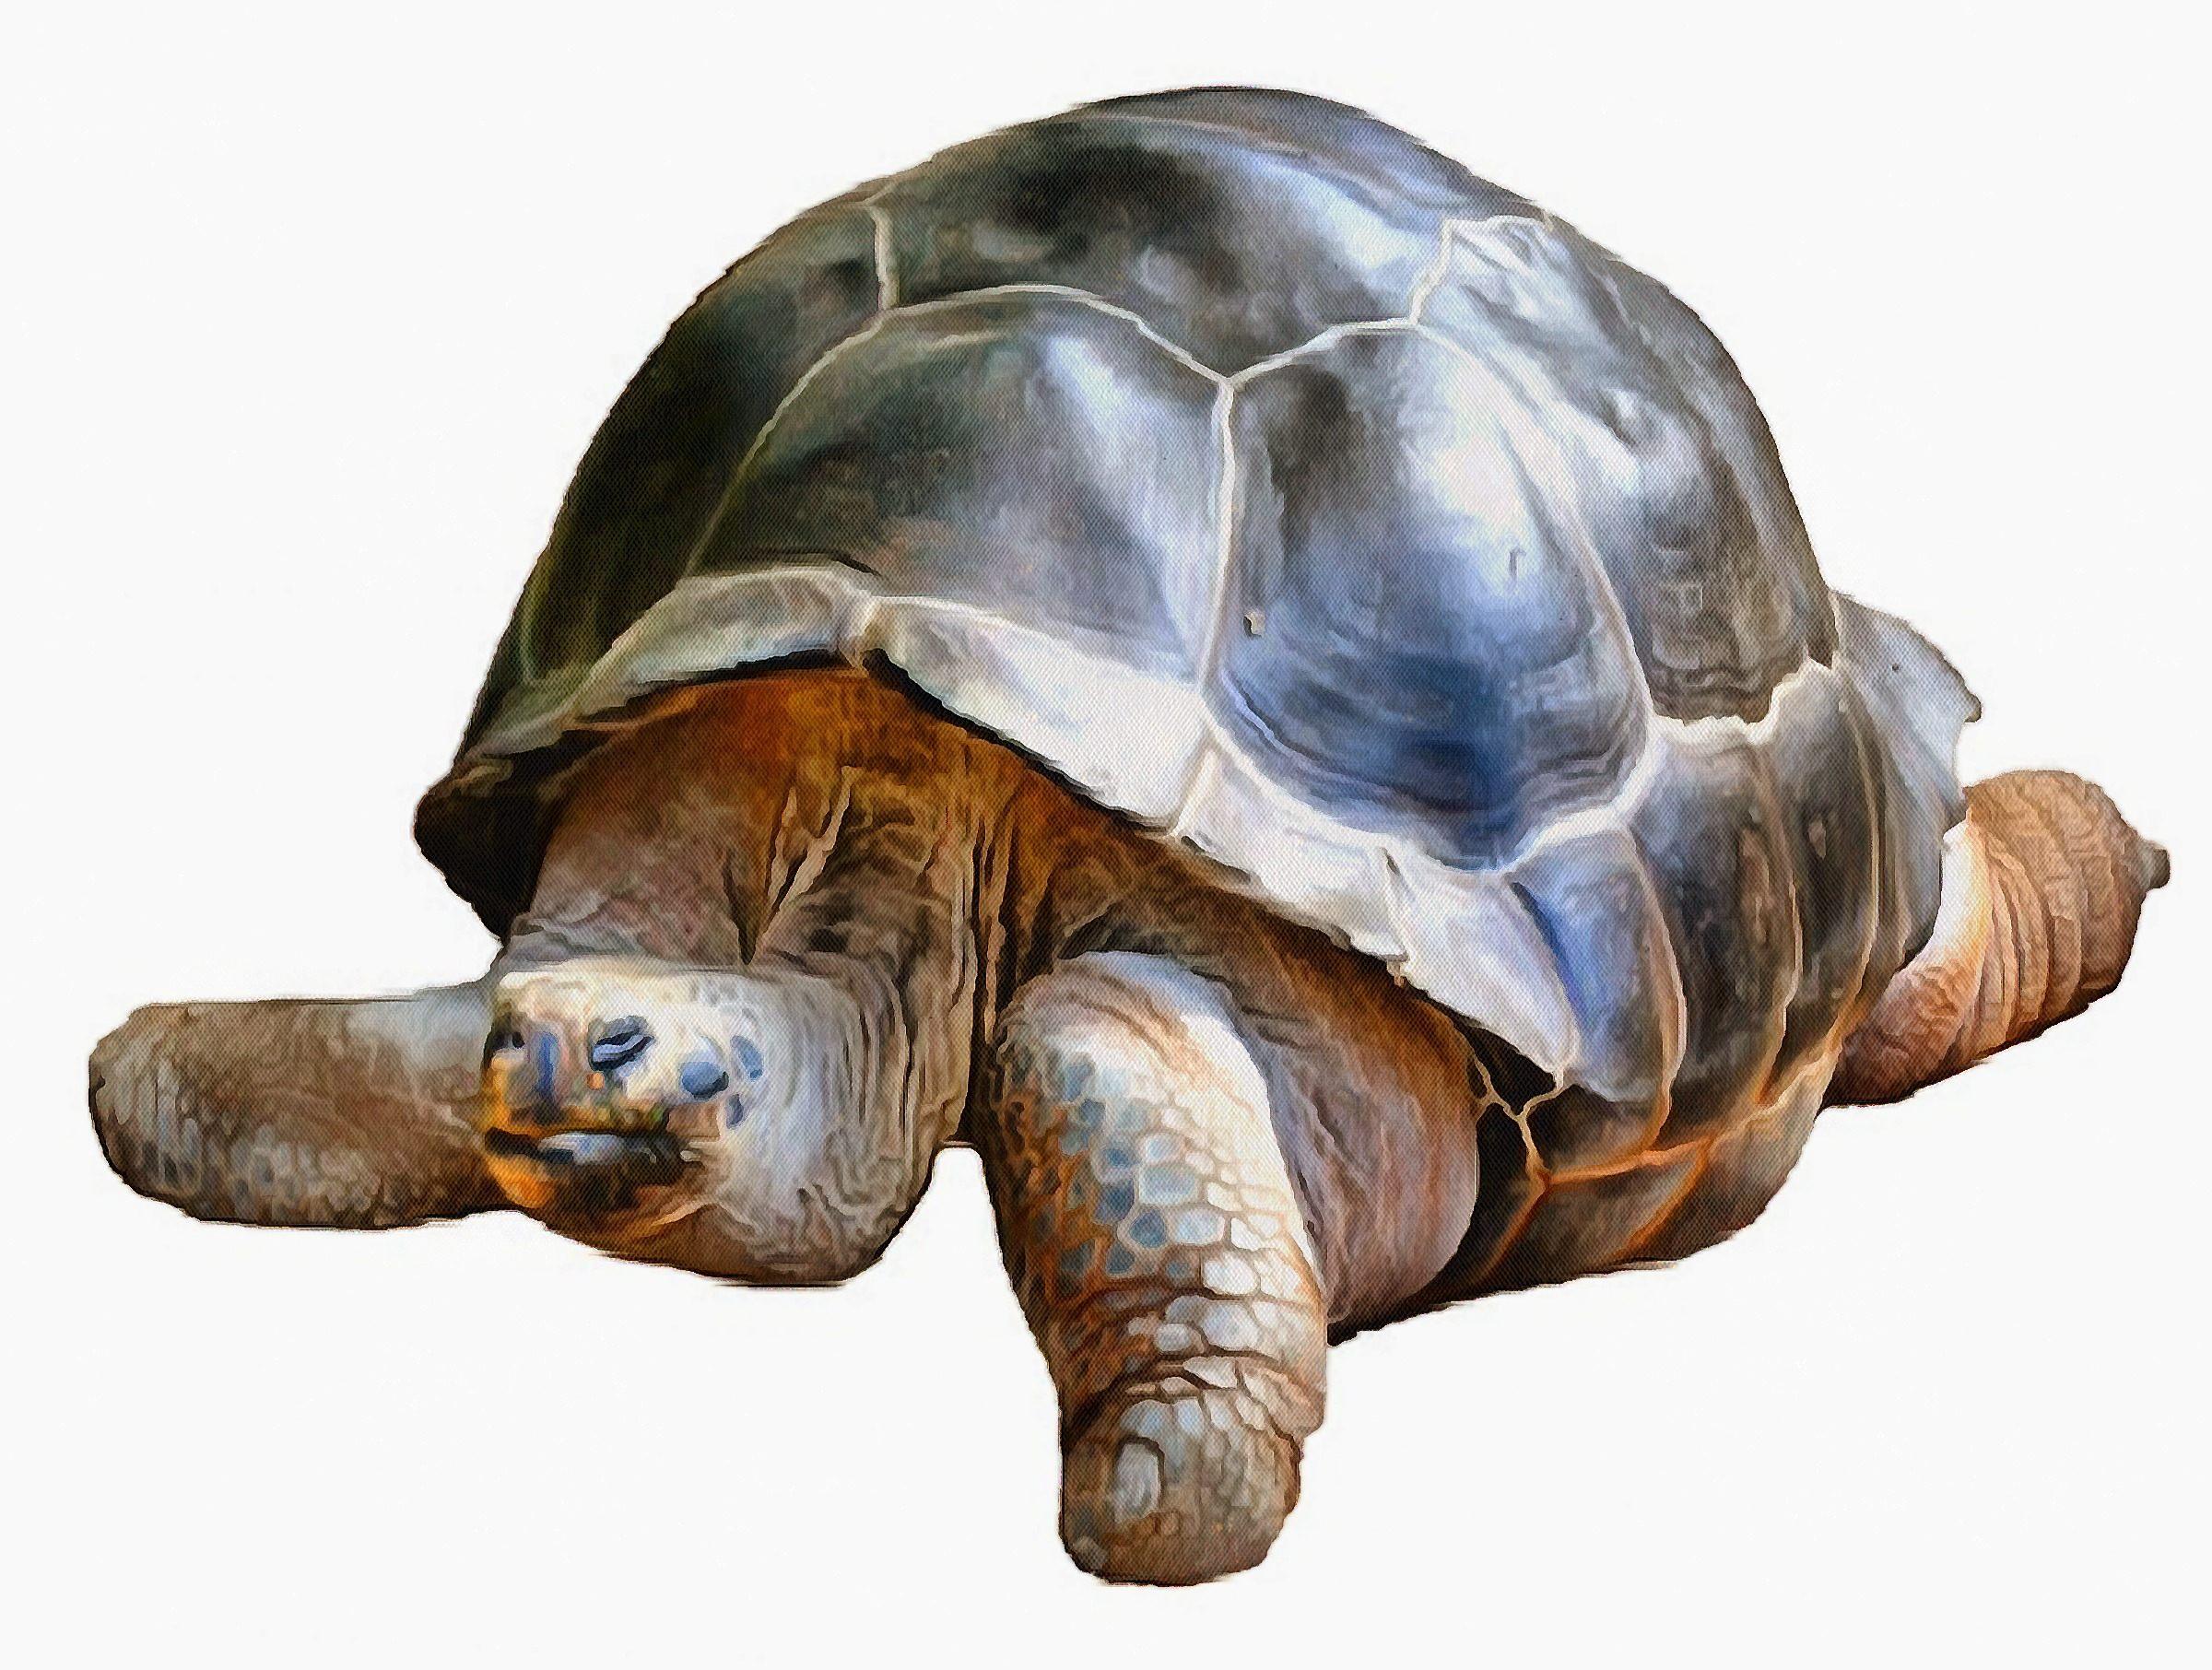 Turtle, Tortoise, Turtle free images, chelonian, leatherback, turtle, – Turtle free images, Tortoise free , Turtle stock free images, Download free images turtles, tortoise free public domain images, tortoise public domain images!